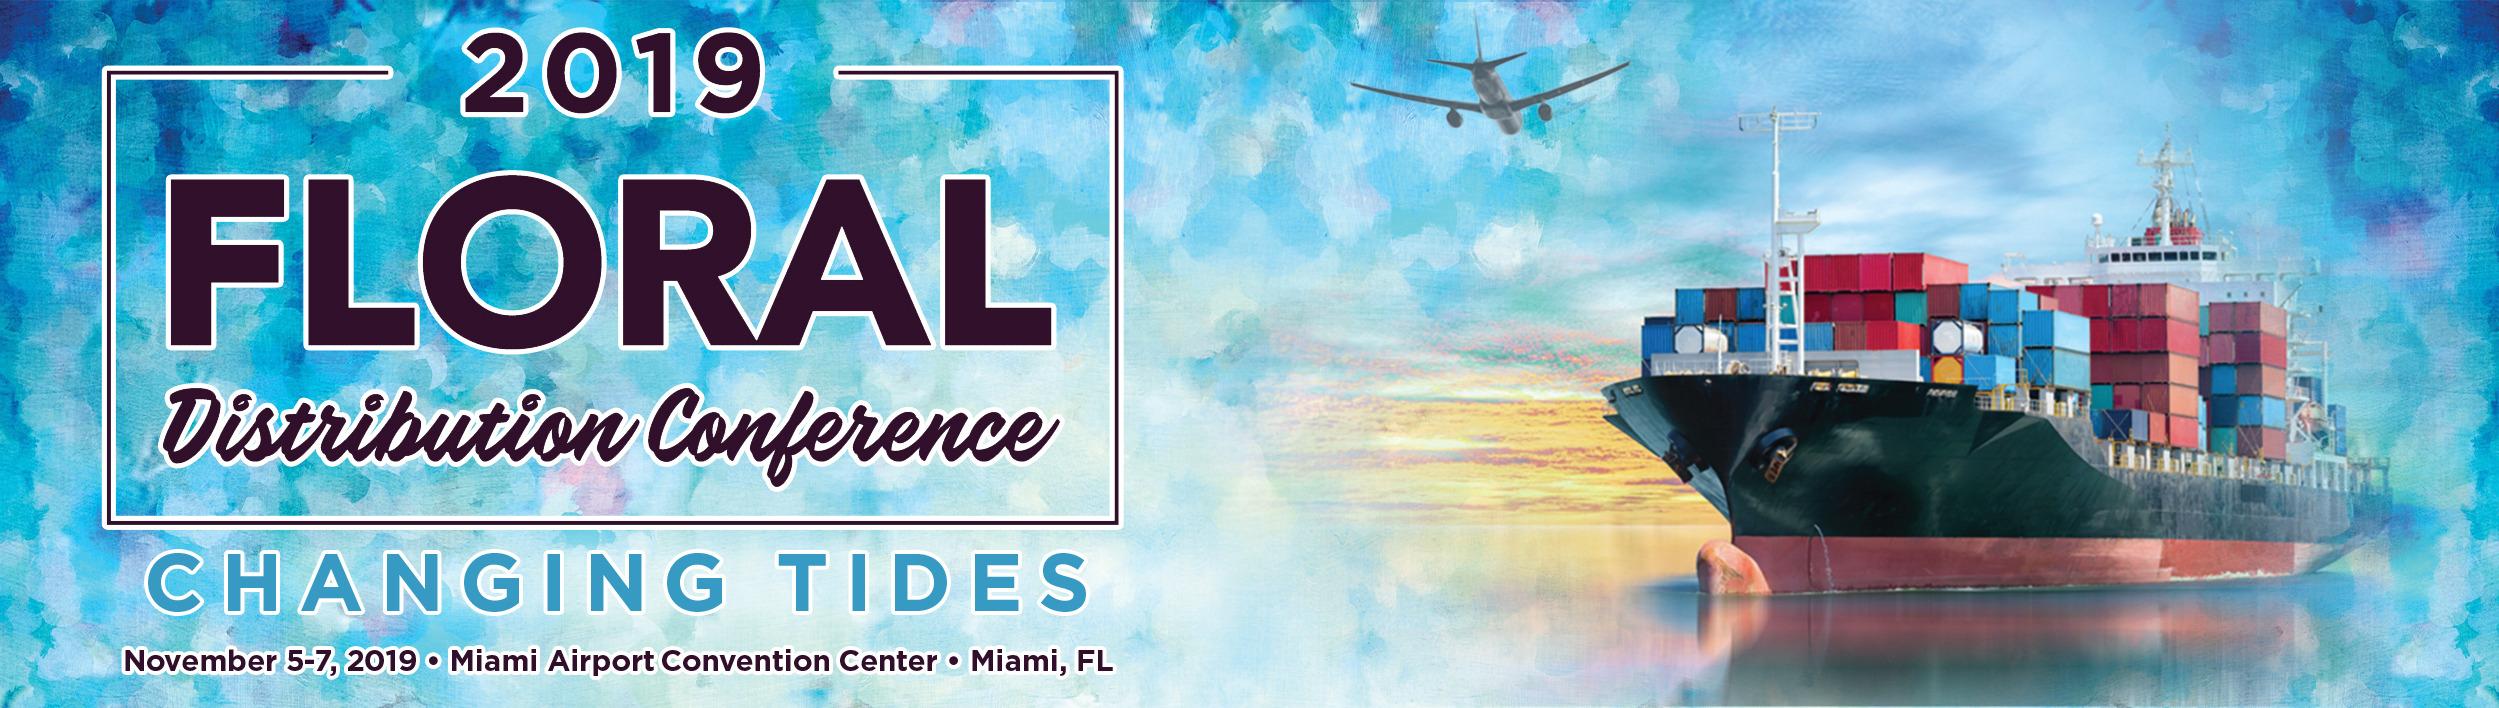 Floral Distribution Conference